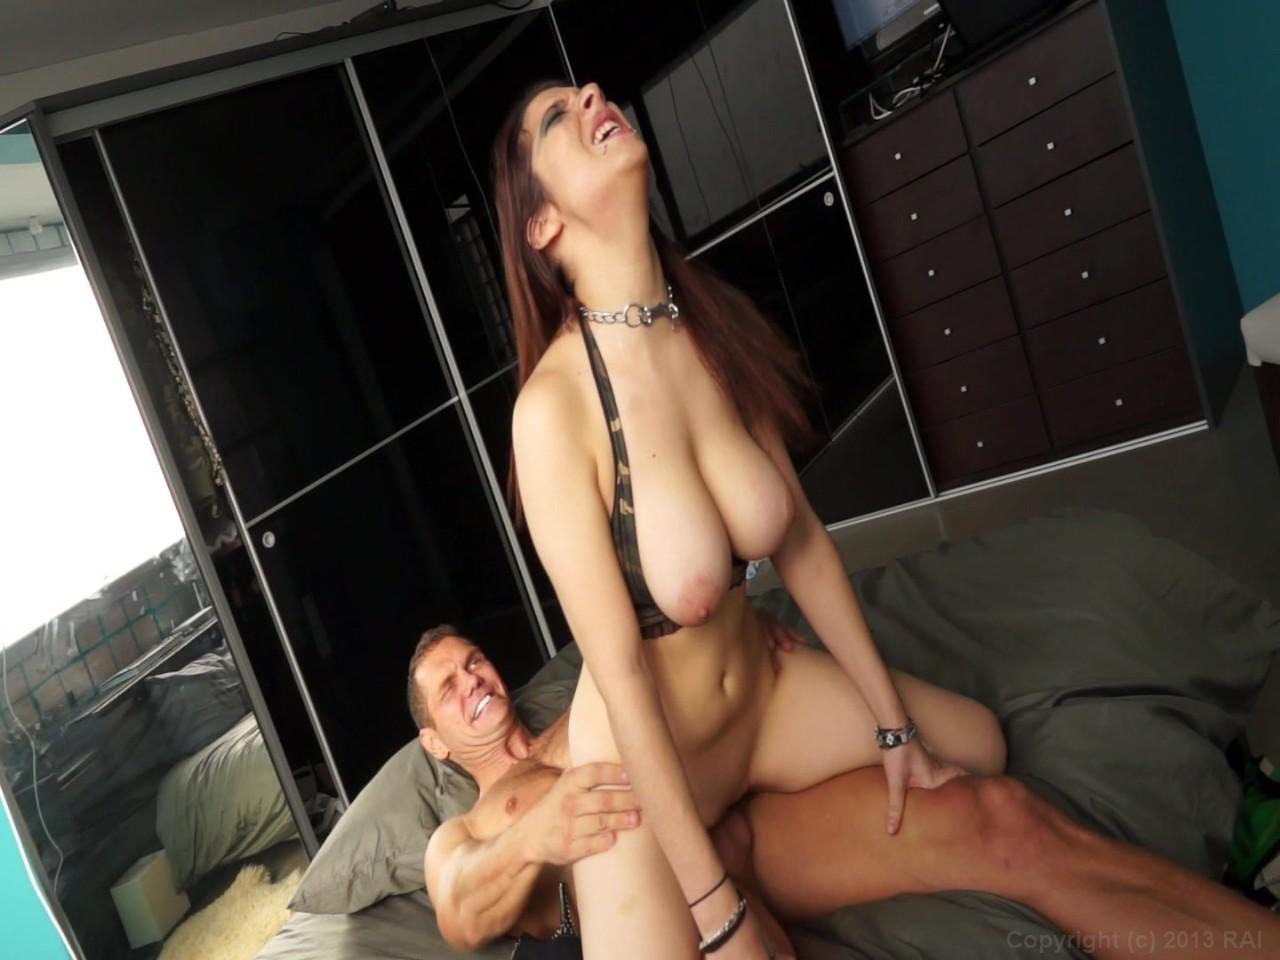 Big Dick Streaming 61